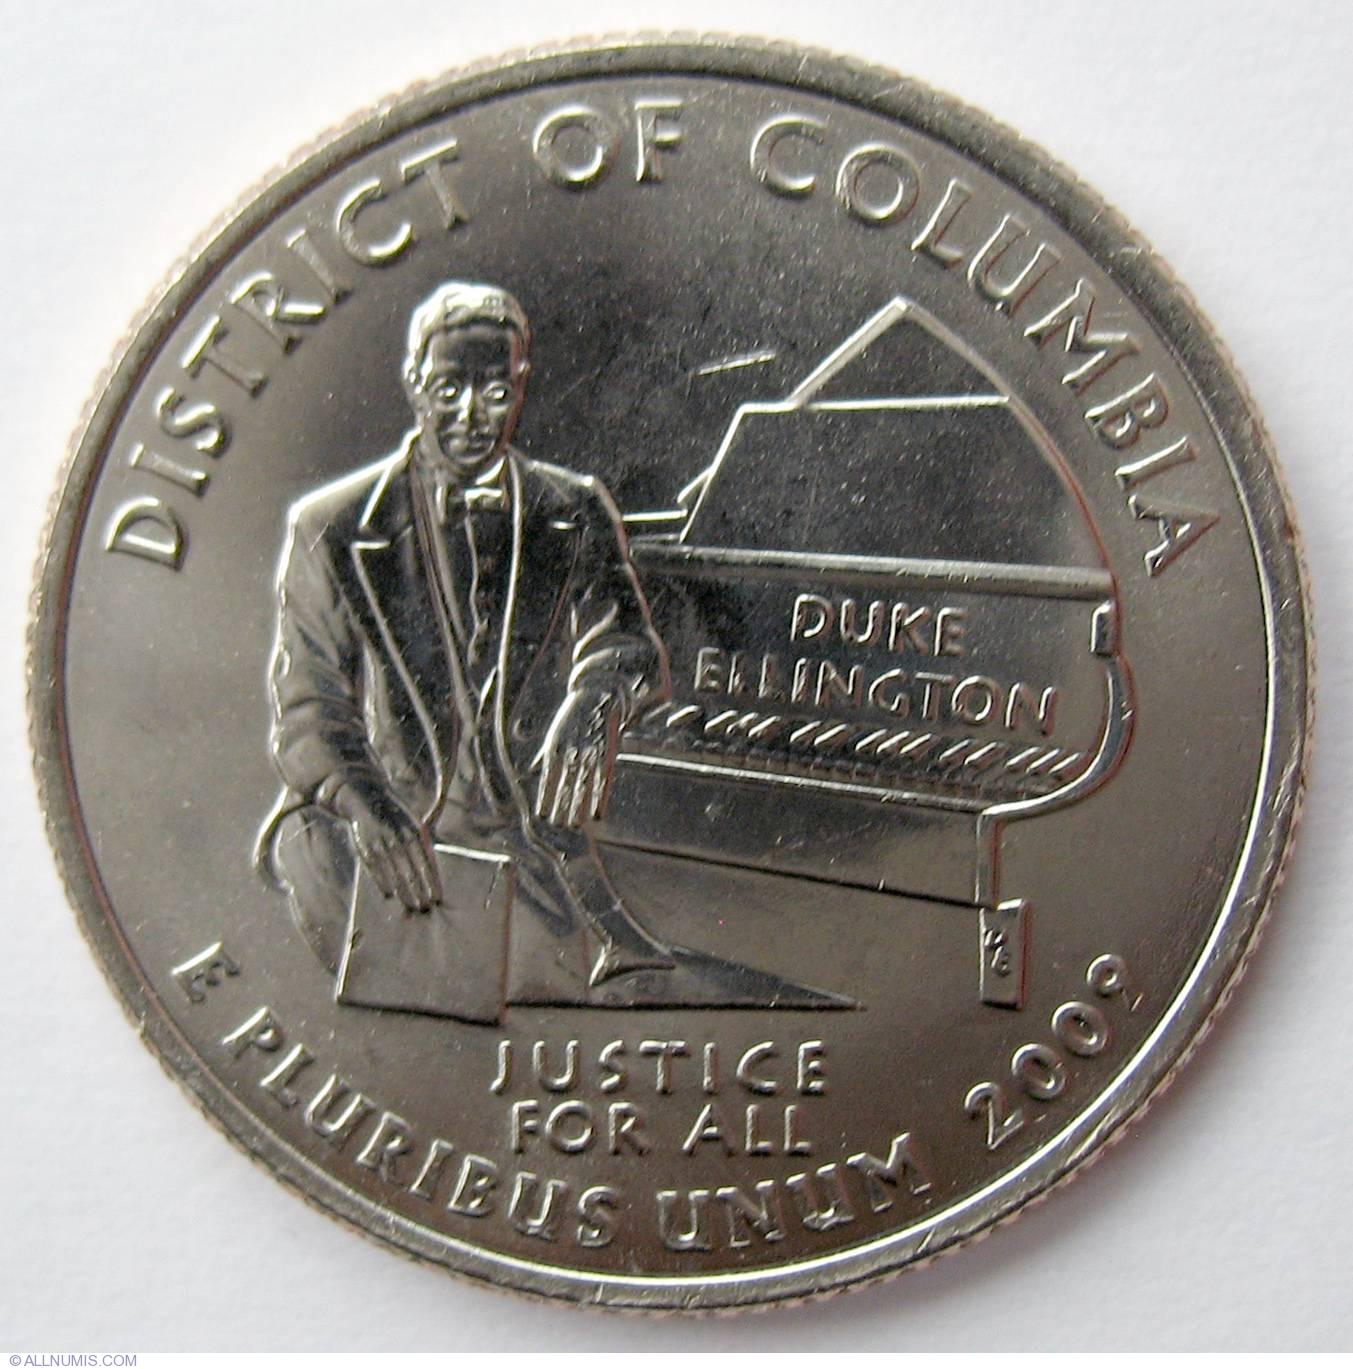 2009 P and D District Of Columbia Washington US Territories Quarters Set